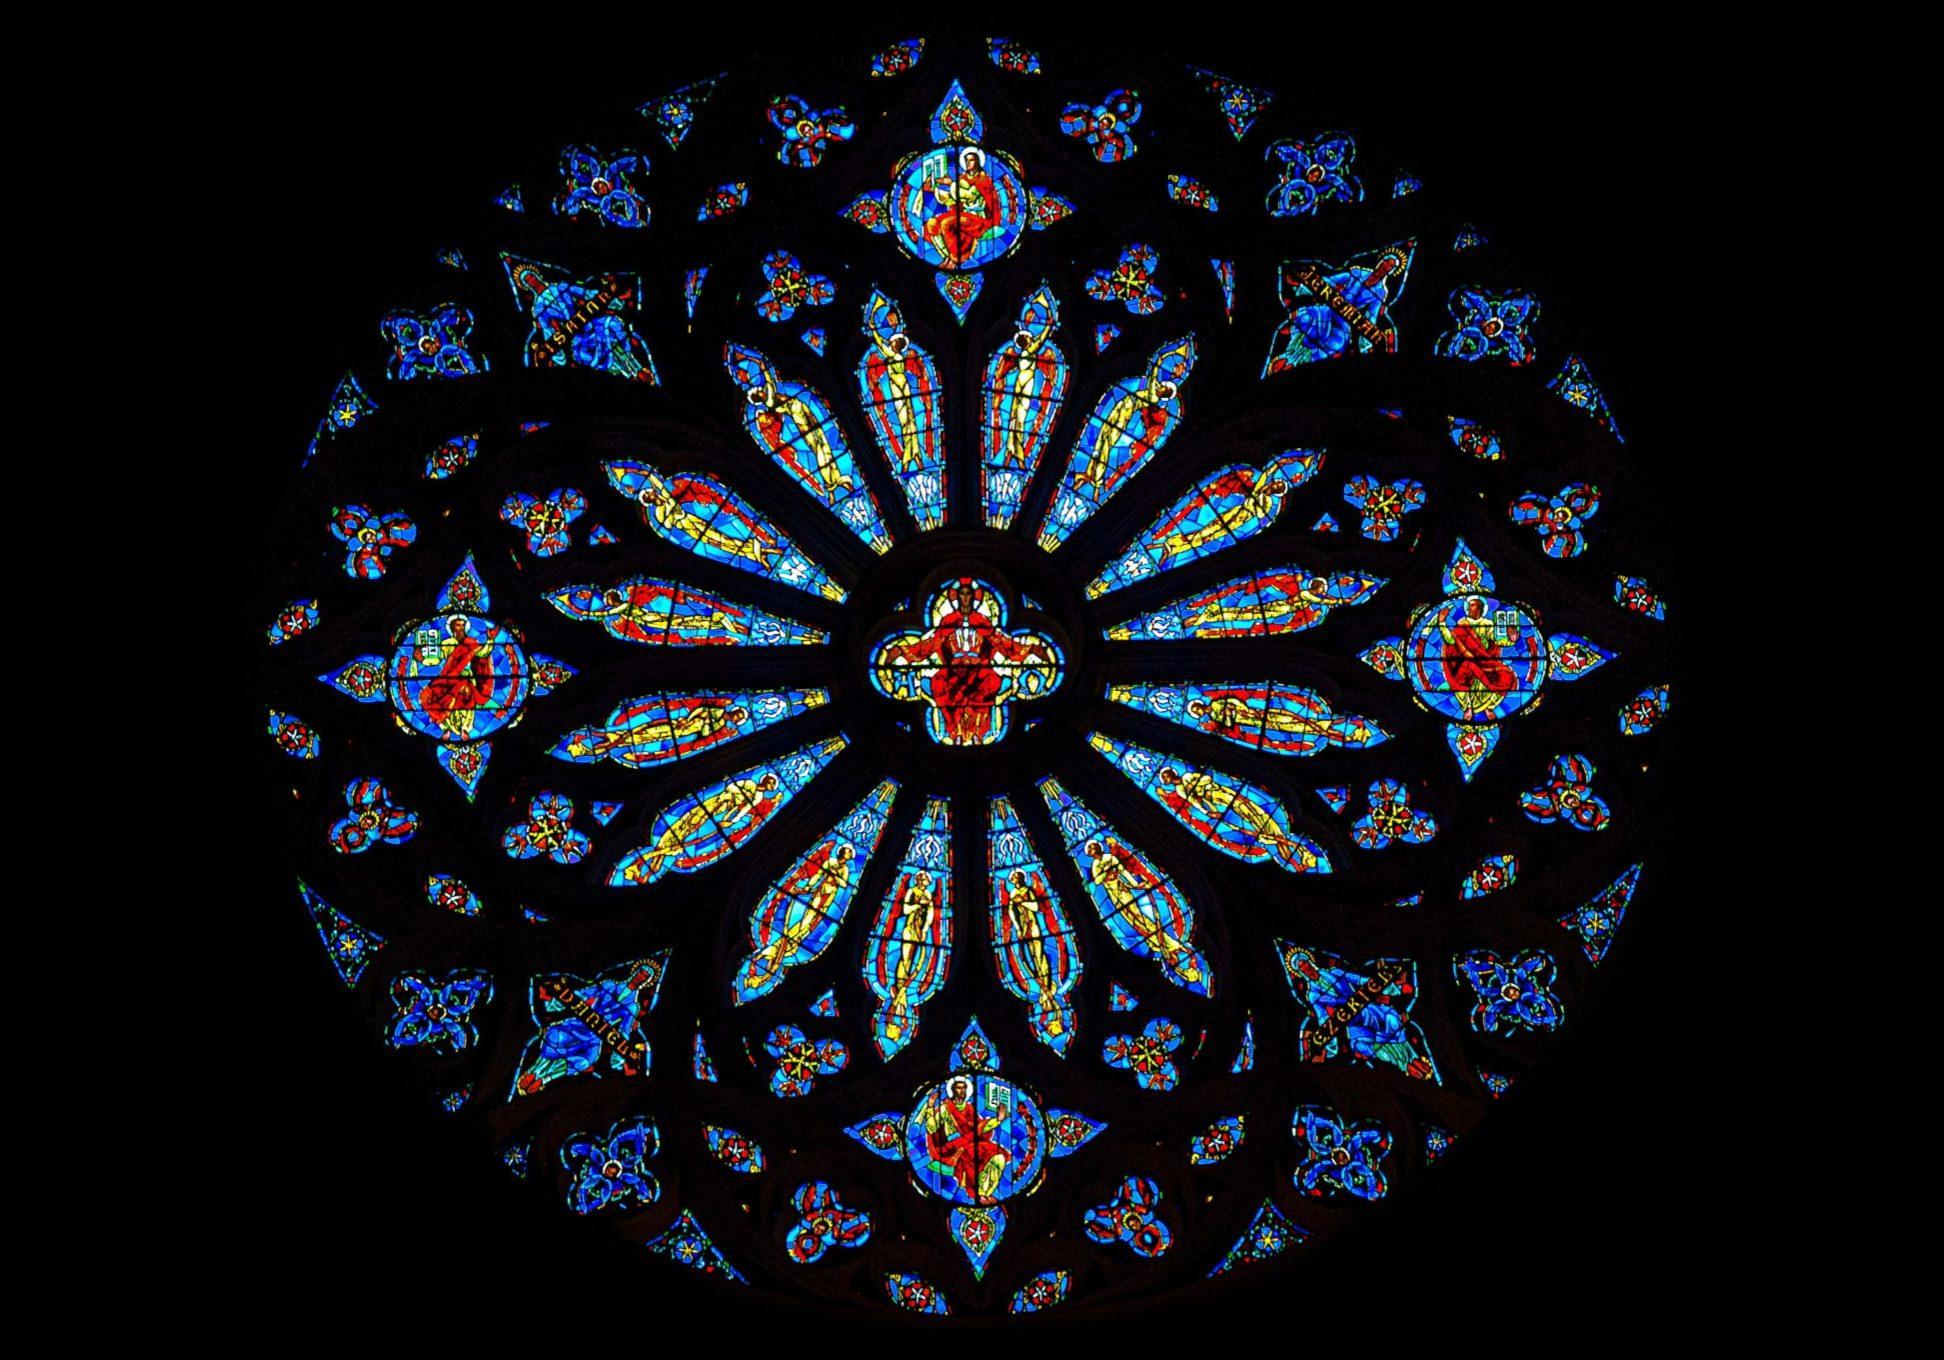 St John the Divine-Unsplash